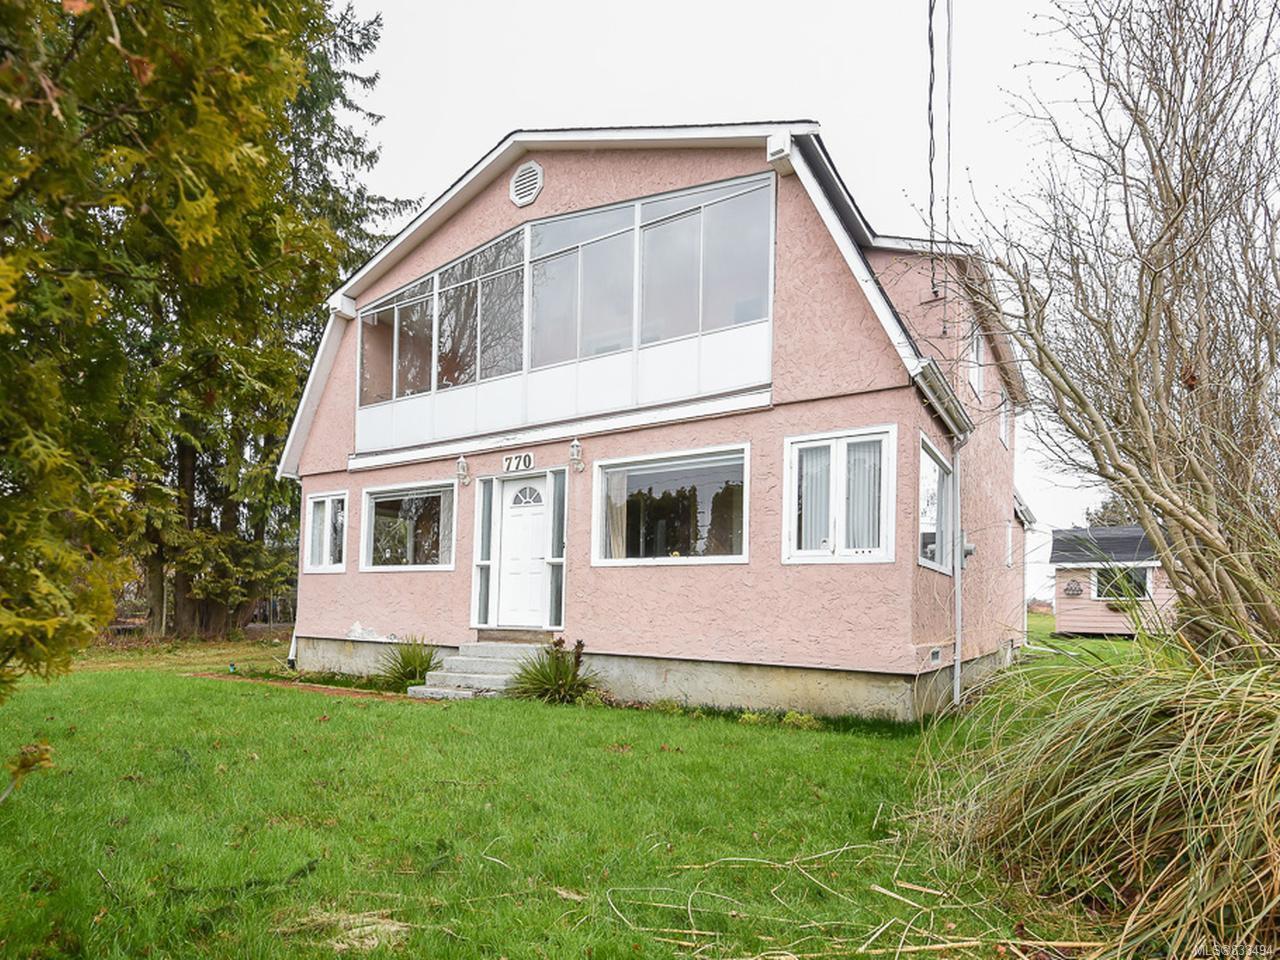 Main Photo: 770 Knight Rd in COMOX: CV Comox Peninsula House for sale (Comox Valley)  : MLS®# 833494